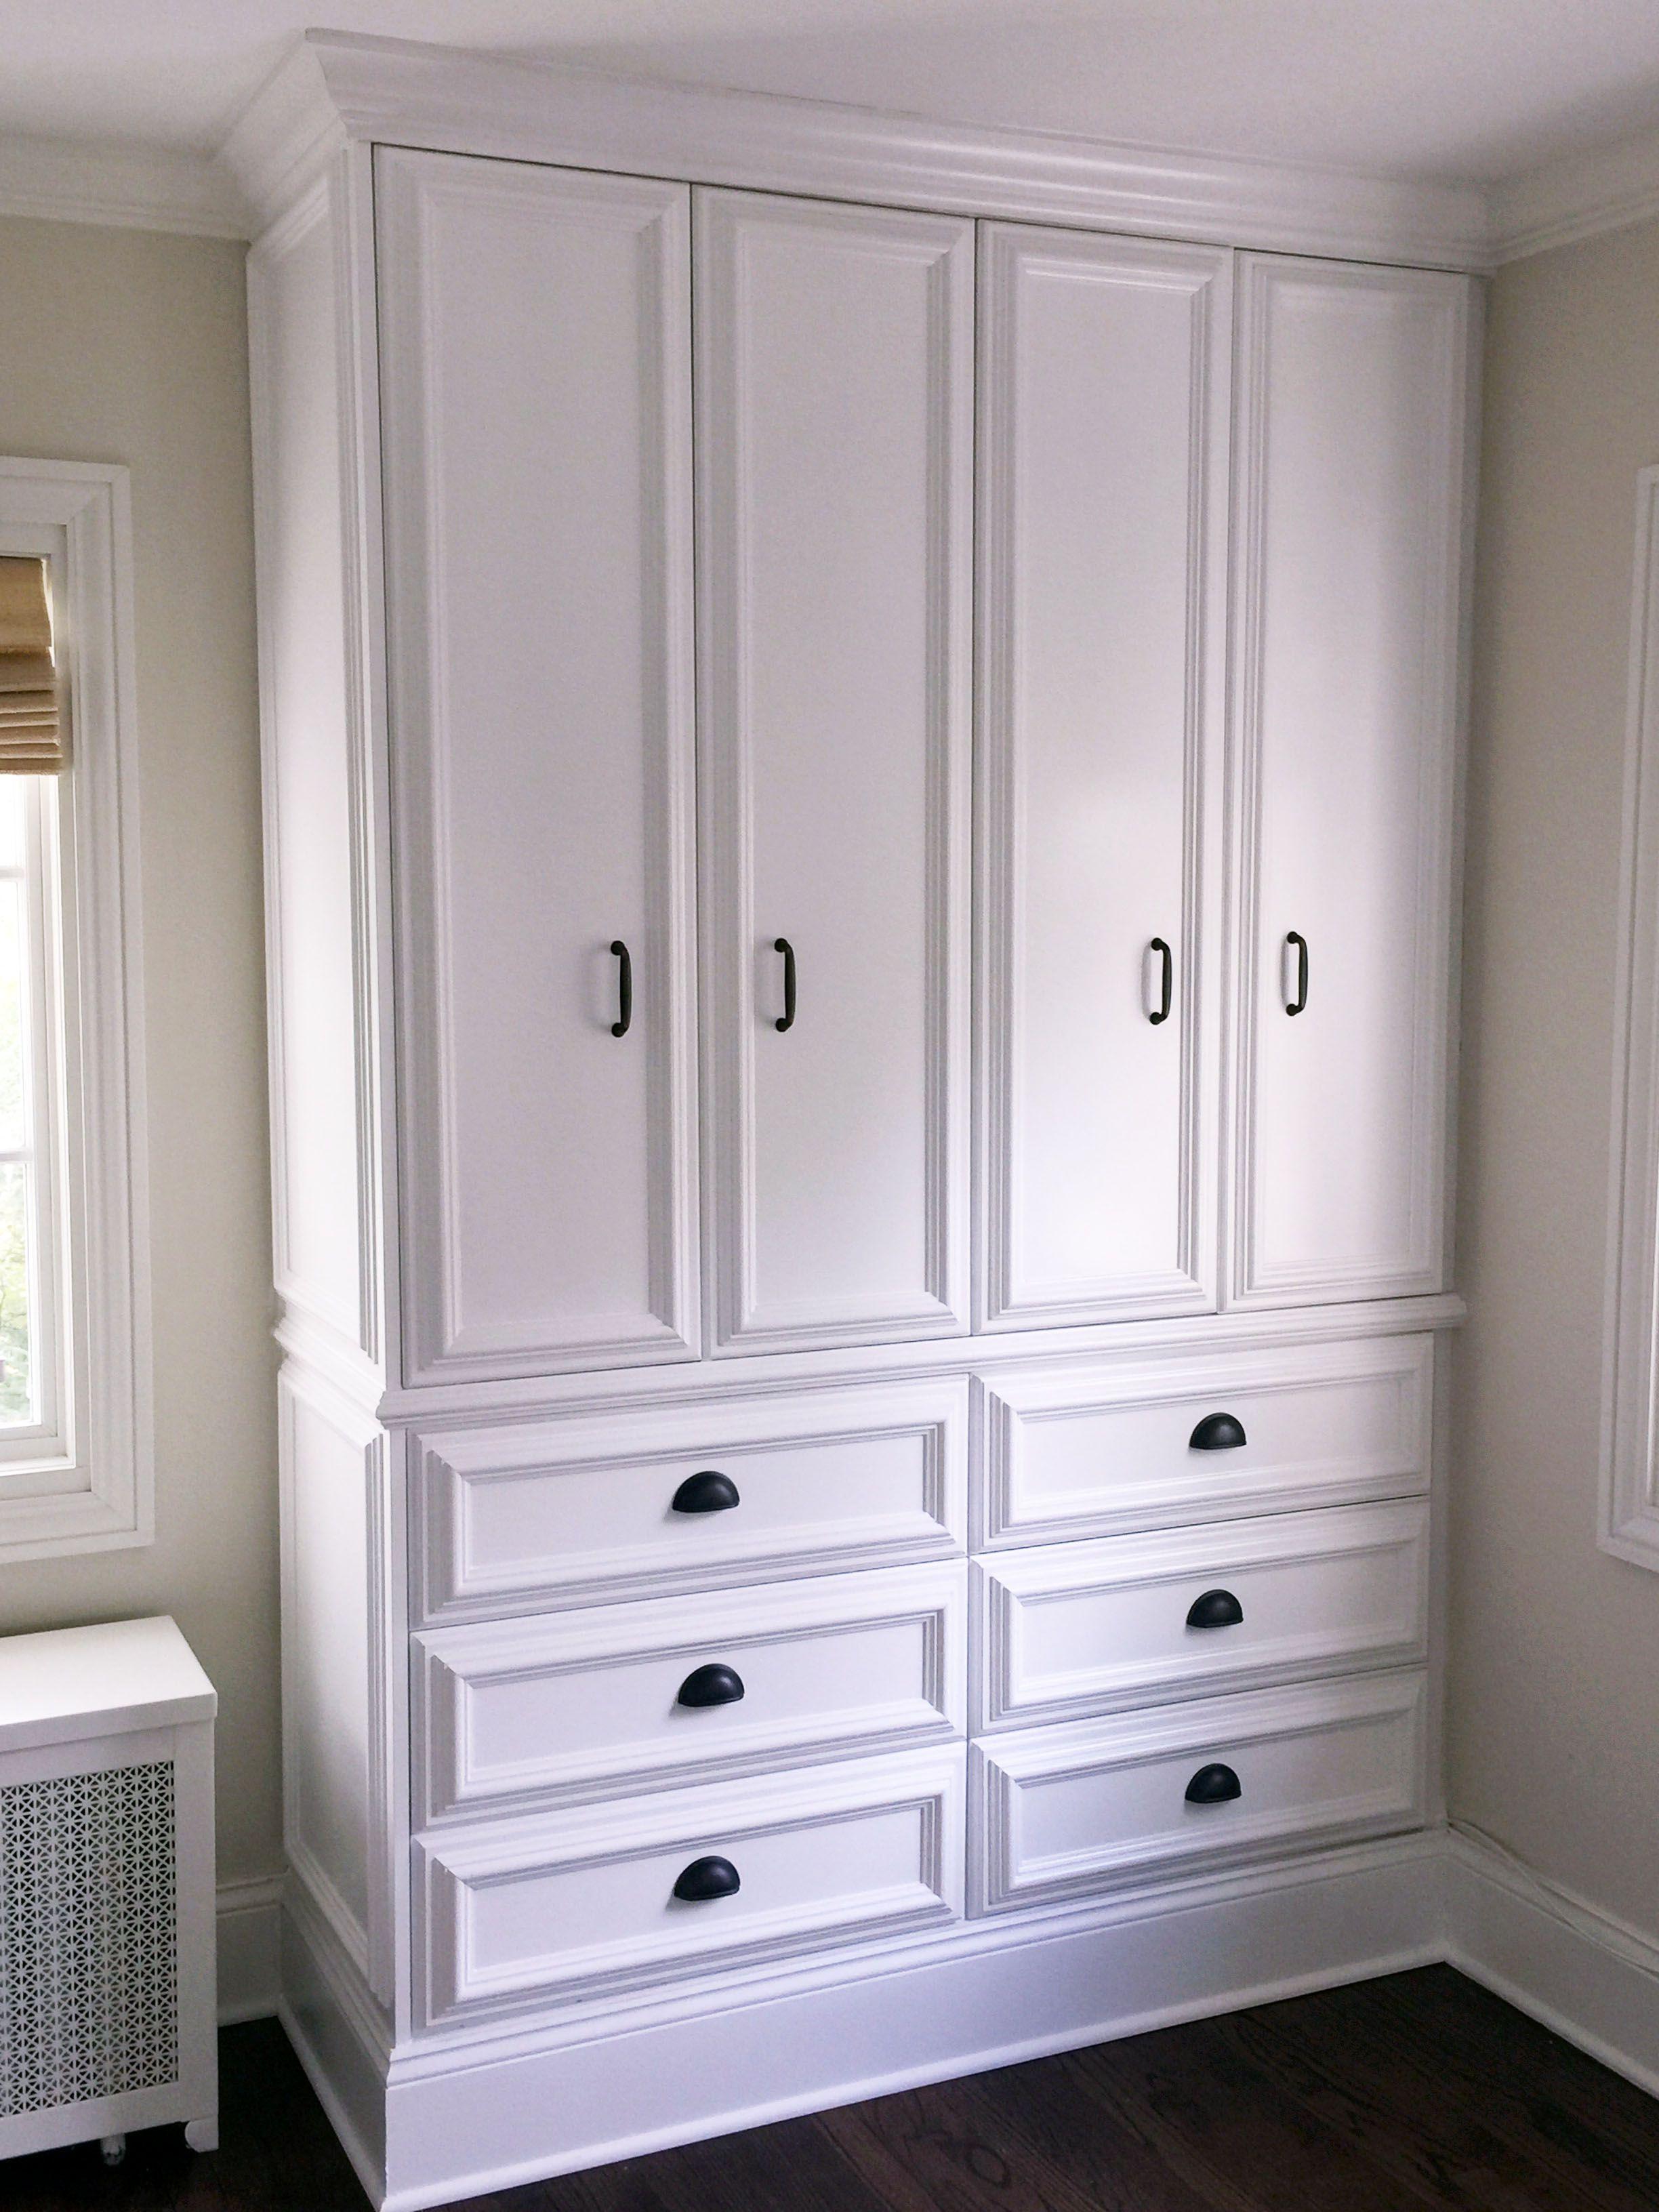 Handmade Custom Bedroom Built In by Built Custom Carpentry ...